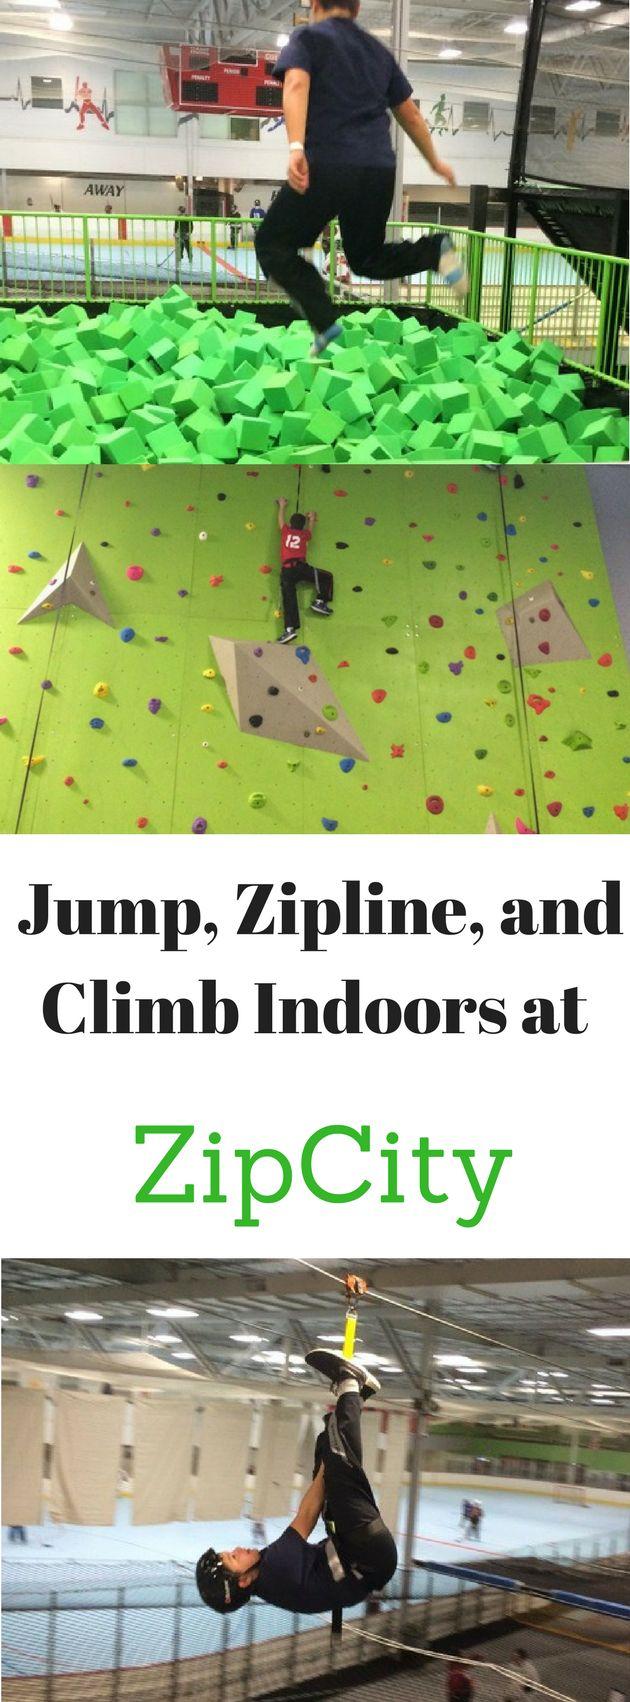 Jump, zipline, and climb indoors at ZipCity in Cincinnati